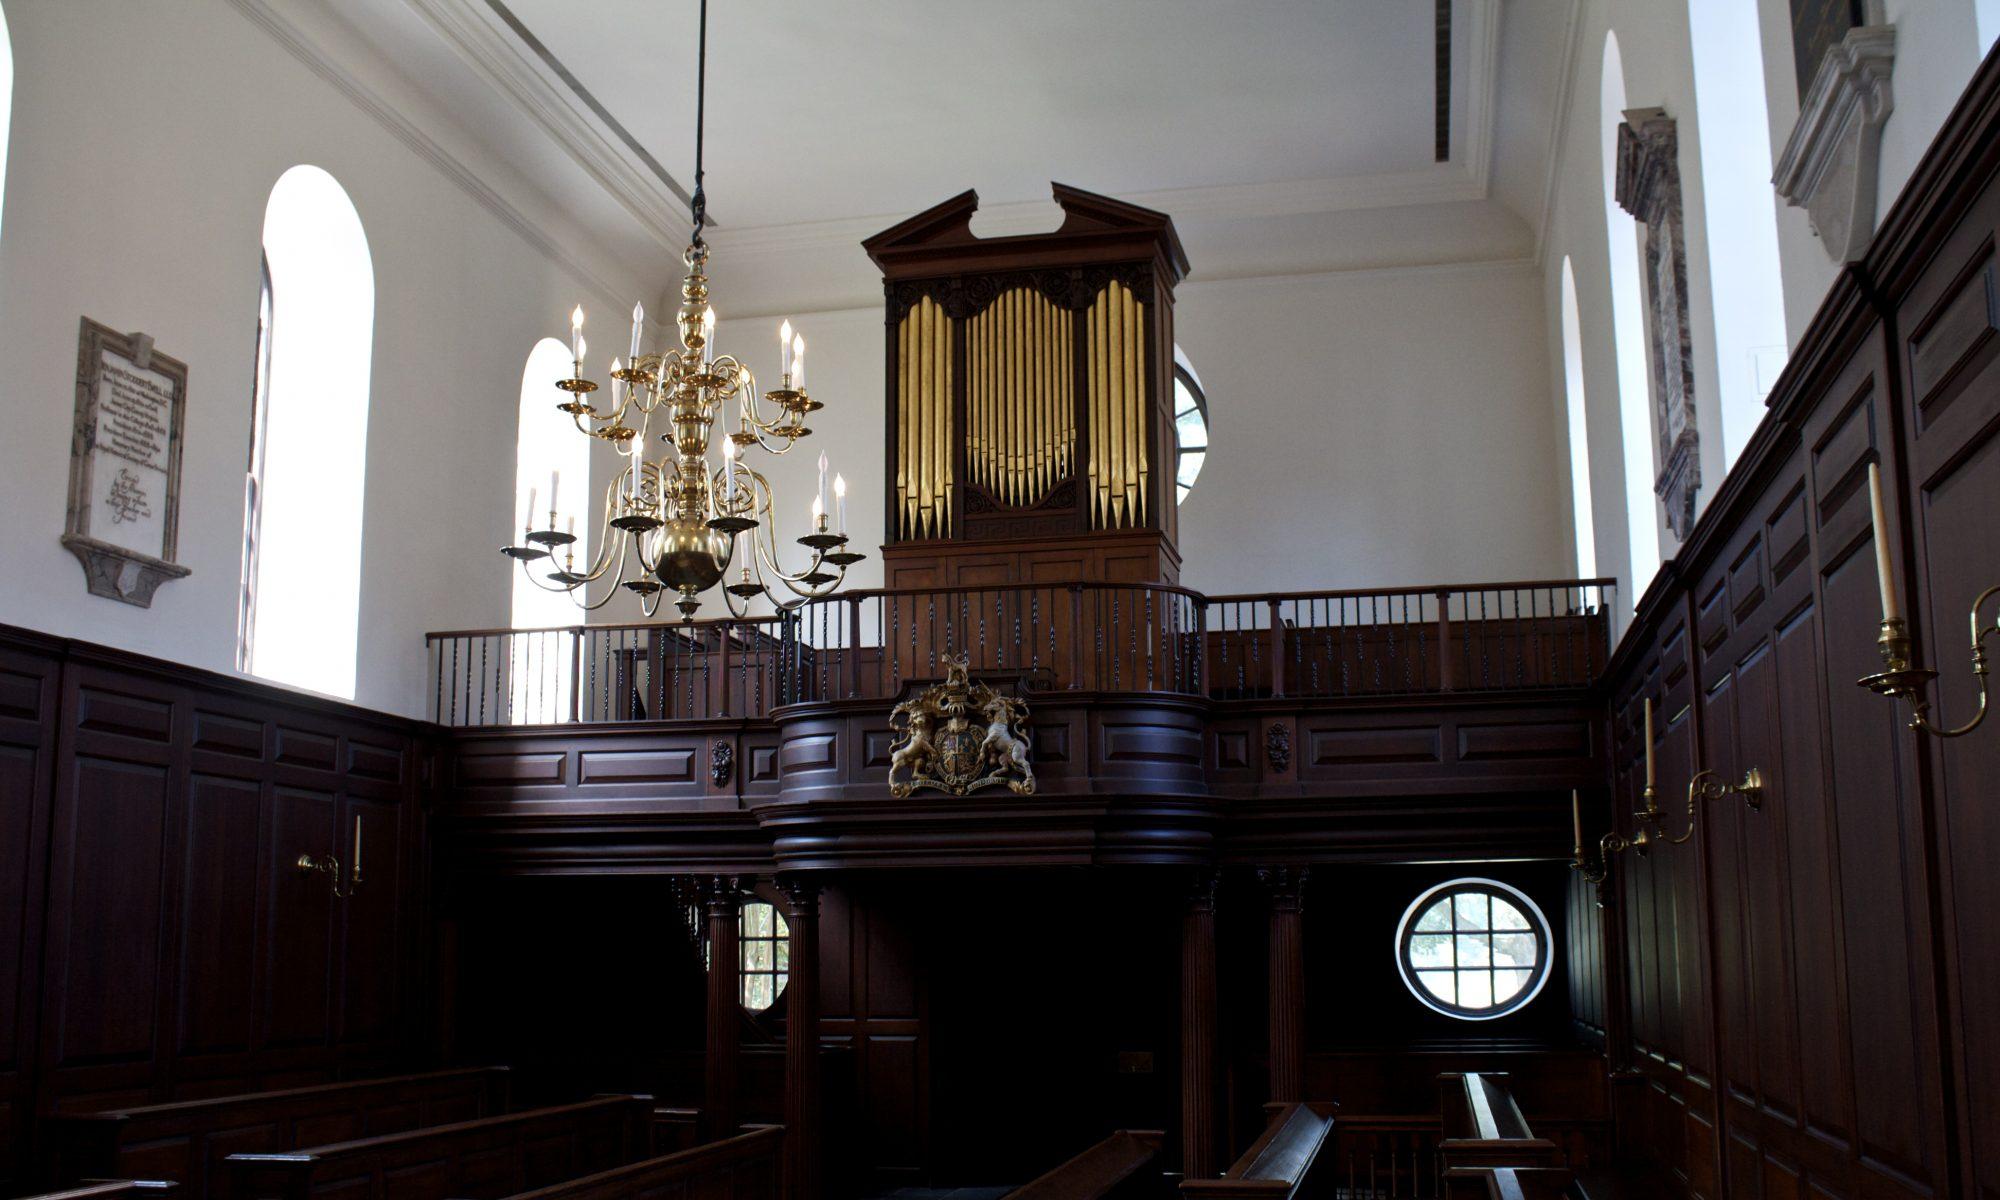 The William & Mary Schola Cantorum